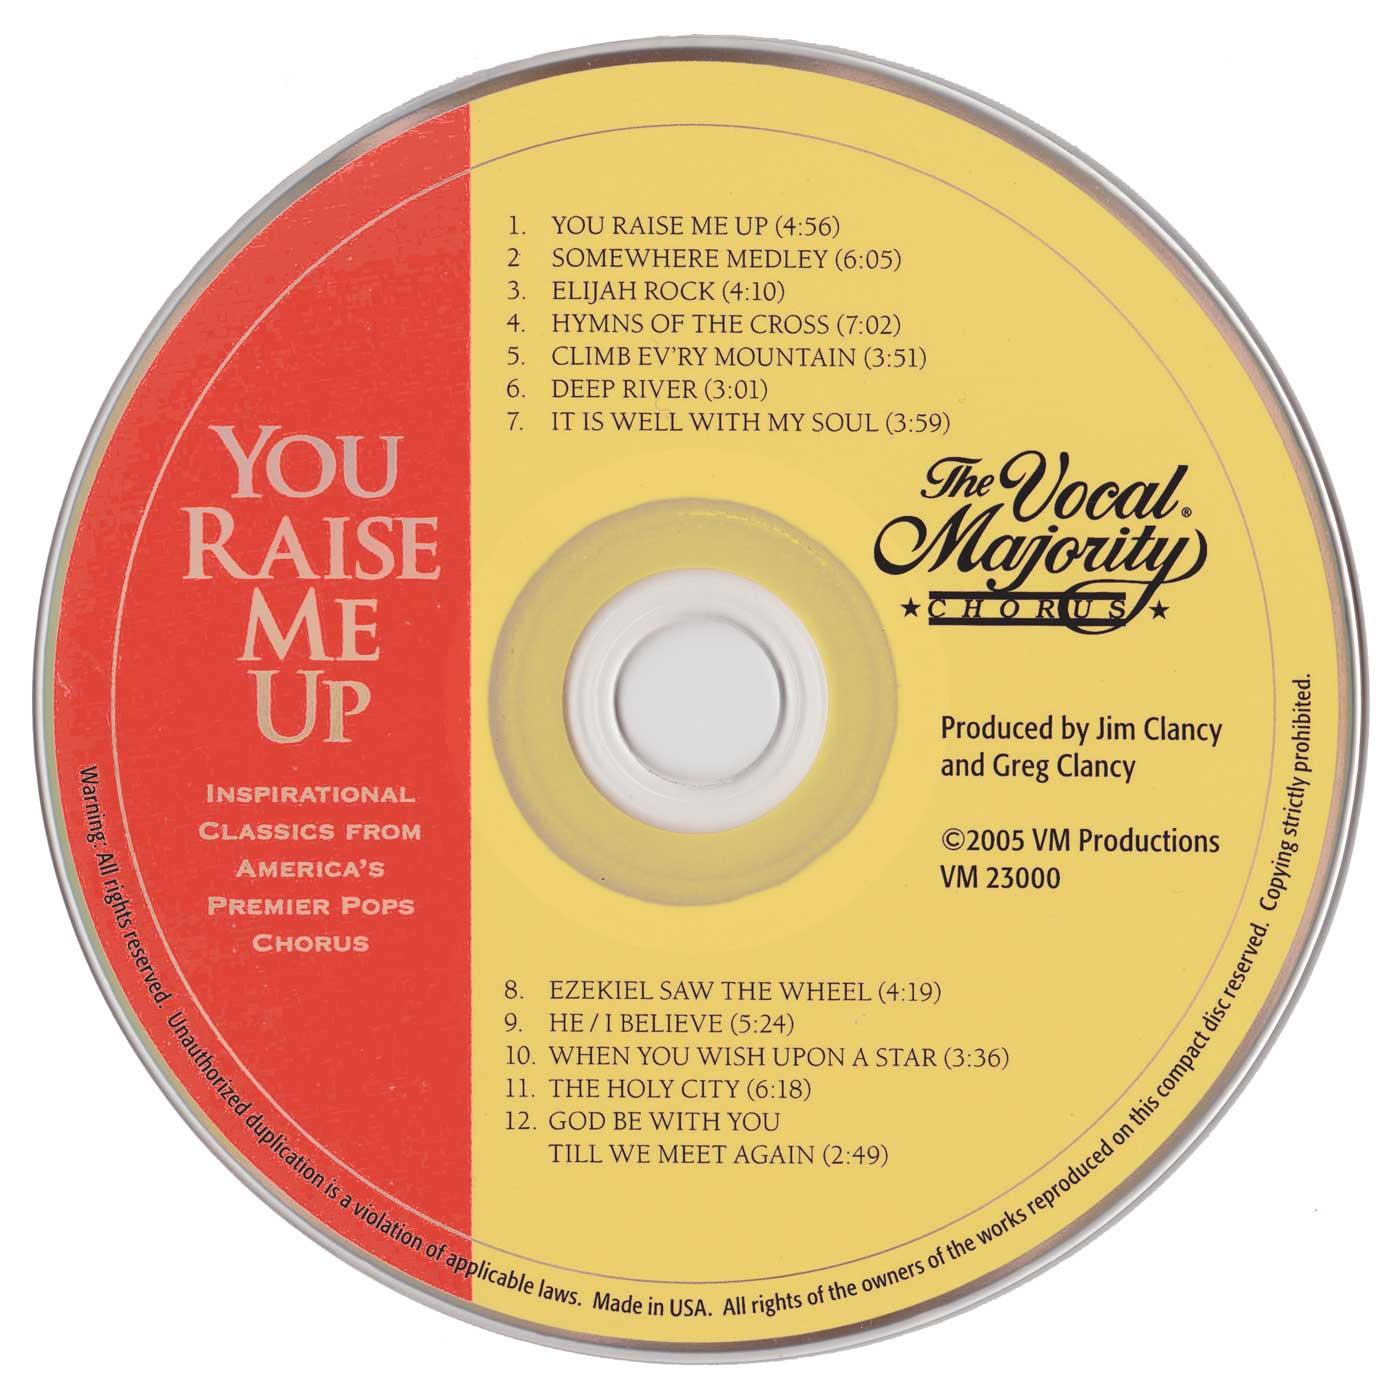 Disc Art: You Raise Me Up